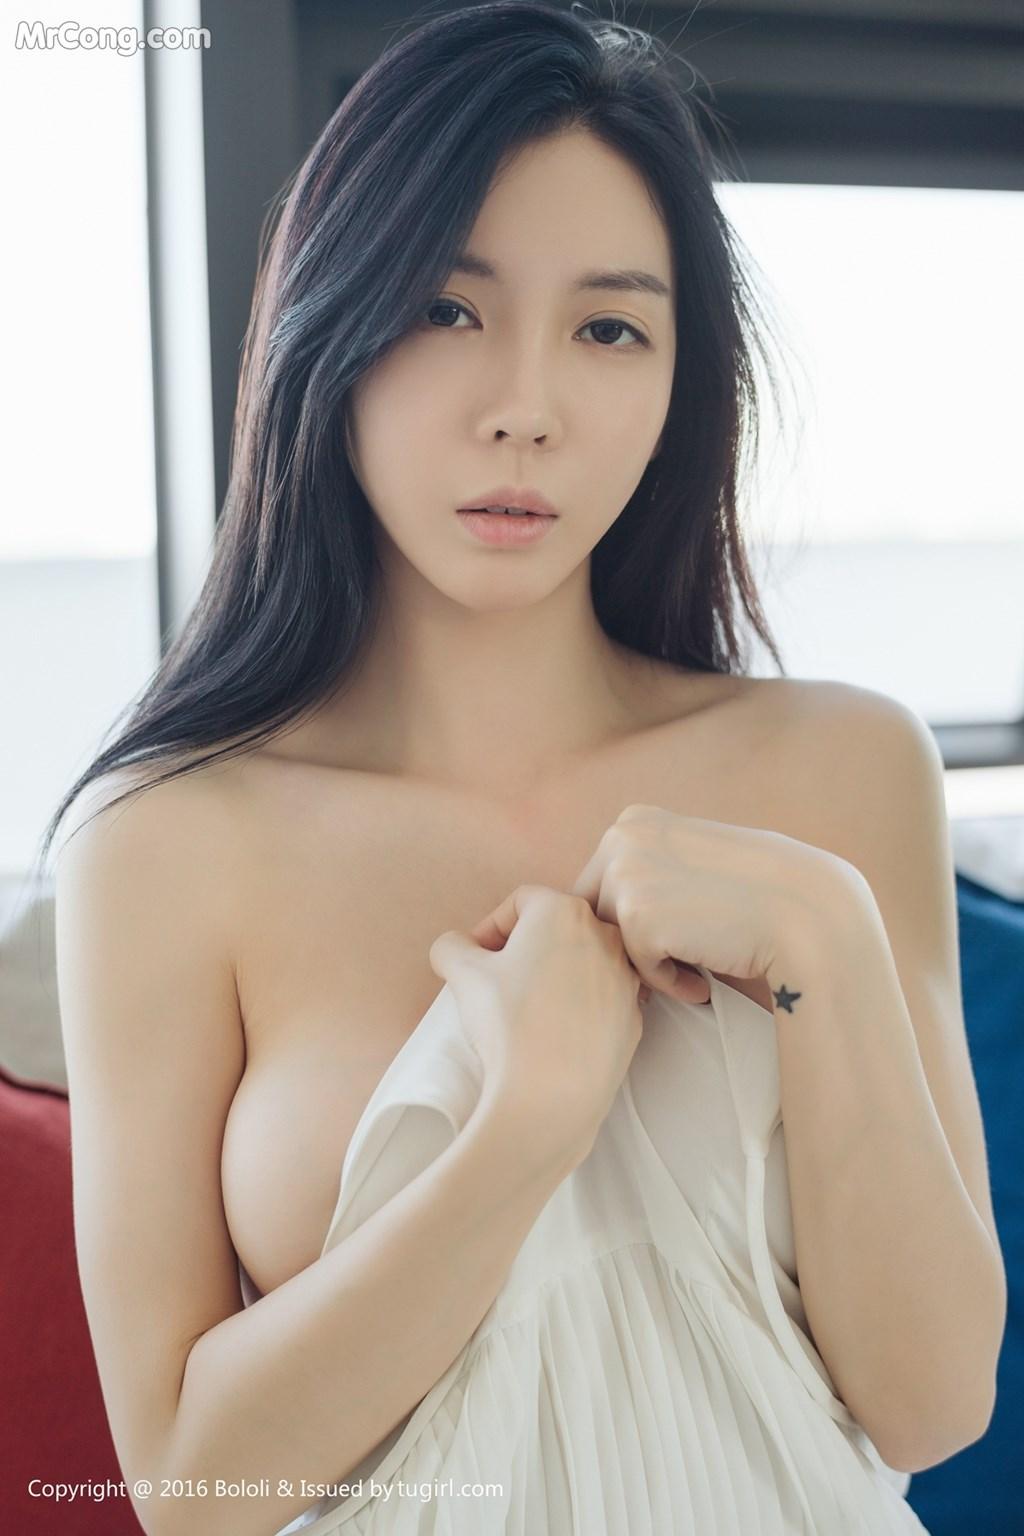 Image BoLoli-2017-09-17-Vol.118-Bebe-Kim-MrCong.com-041 in post BoLoli 2017-09-17 Vol.118: Người mẫu Bebe_Kim (48 ảnh)